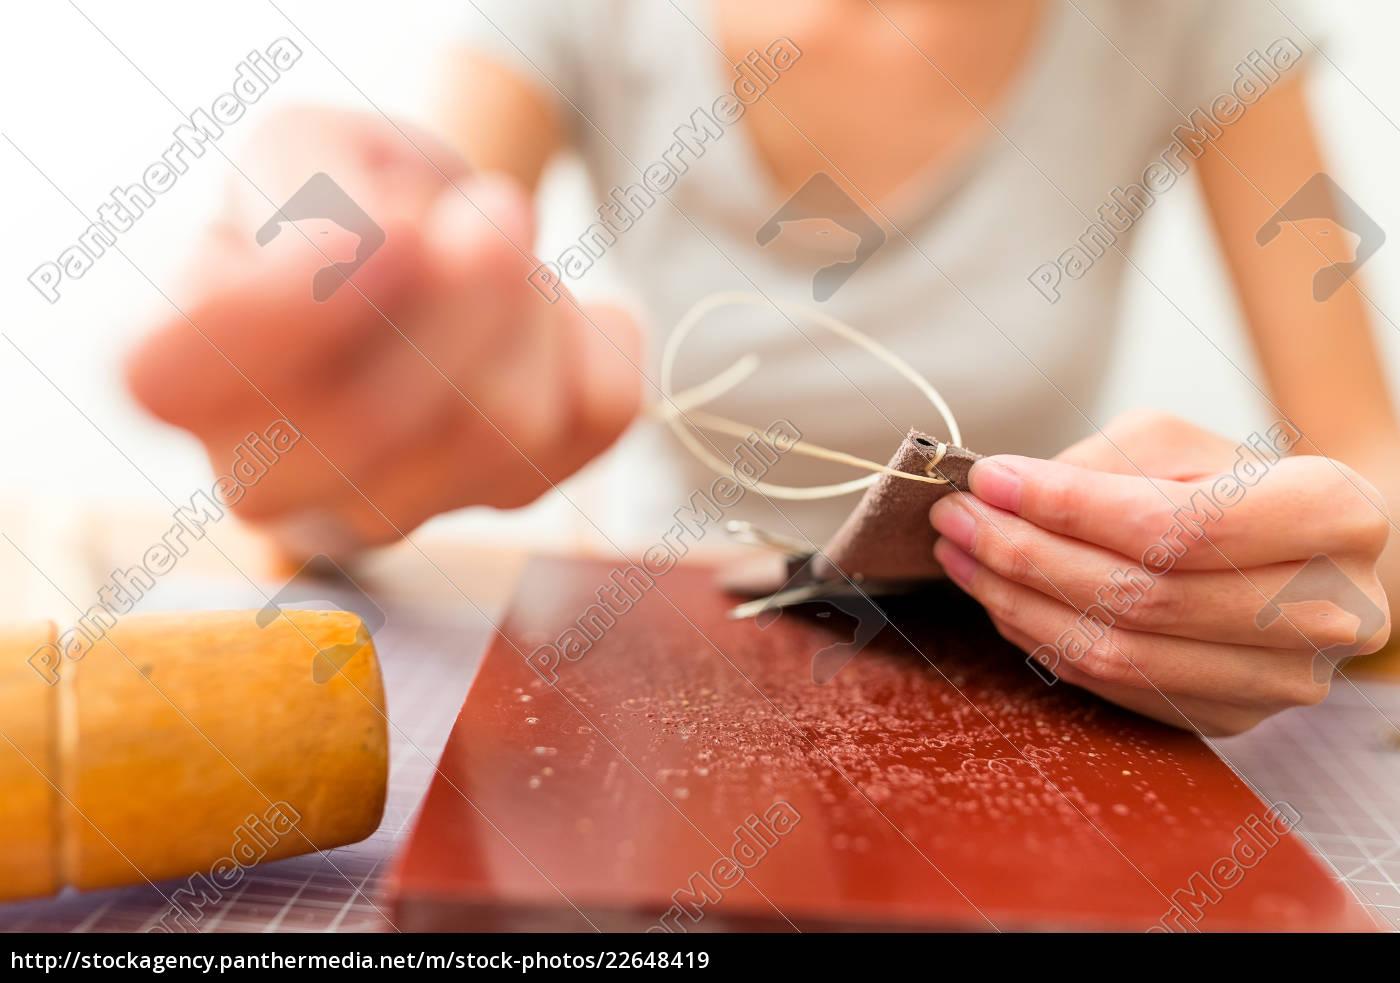 leather, handbag, craftsman, at, work, in - 22648419